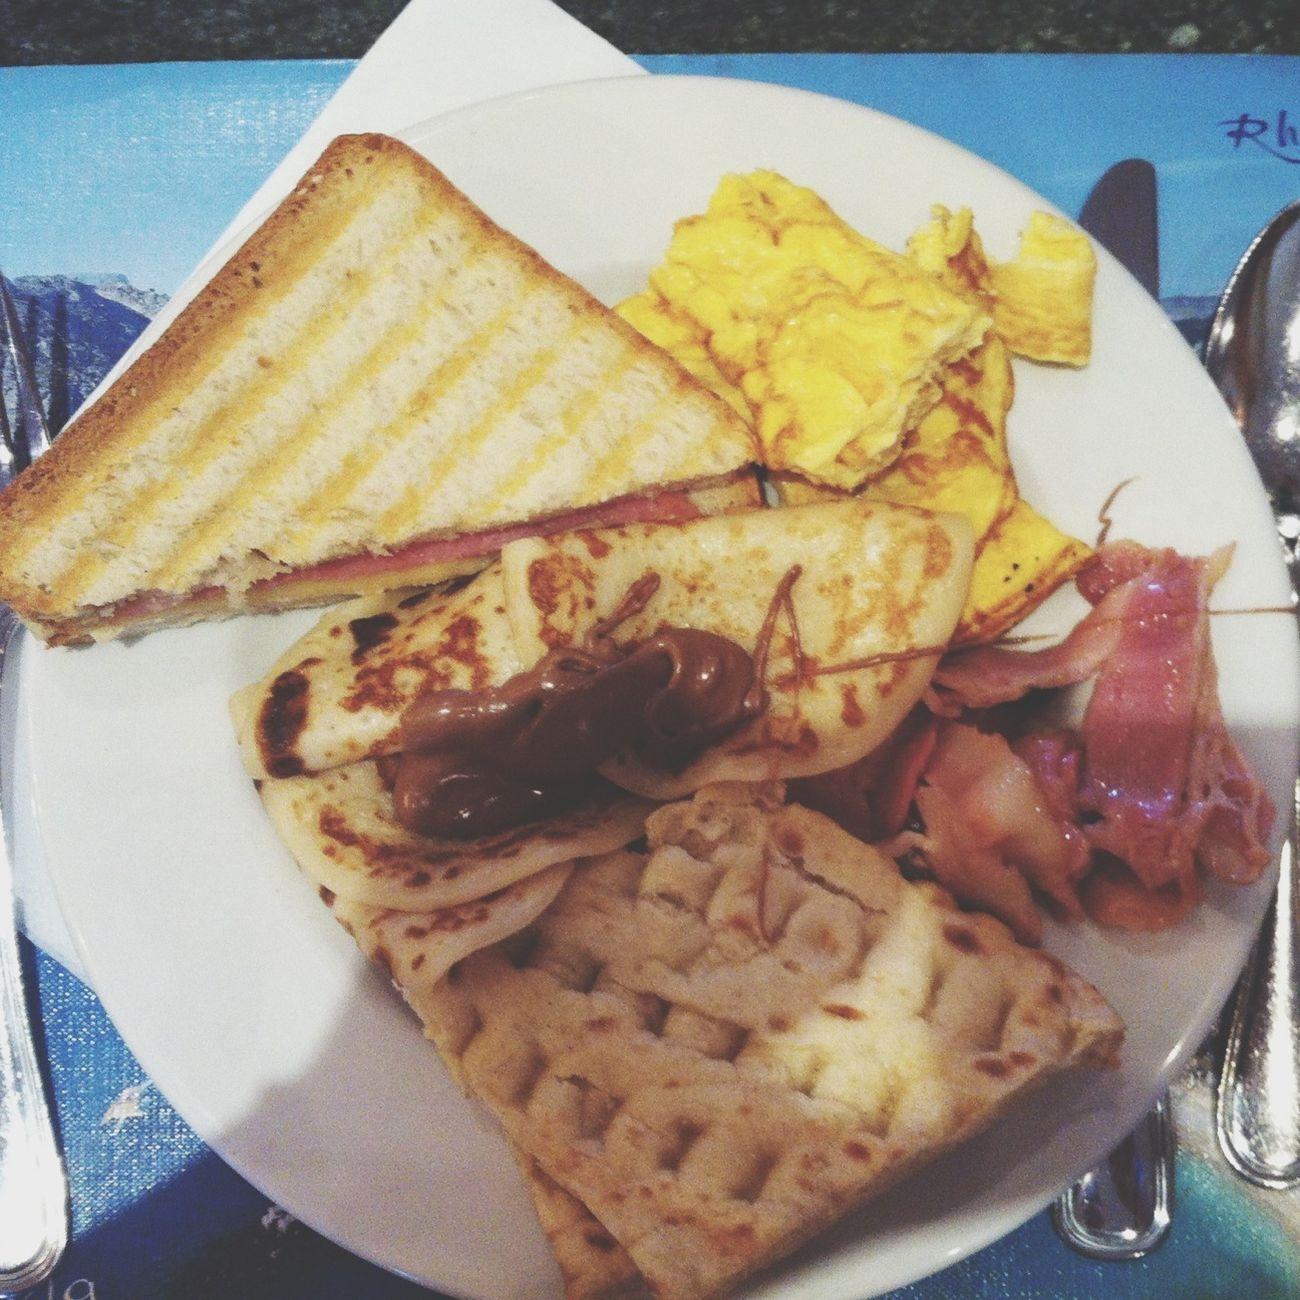 Worlds best breakfast